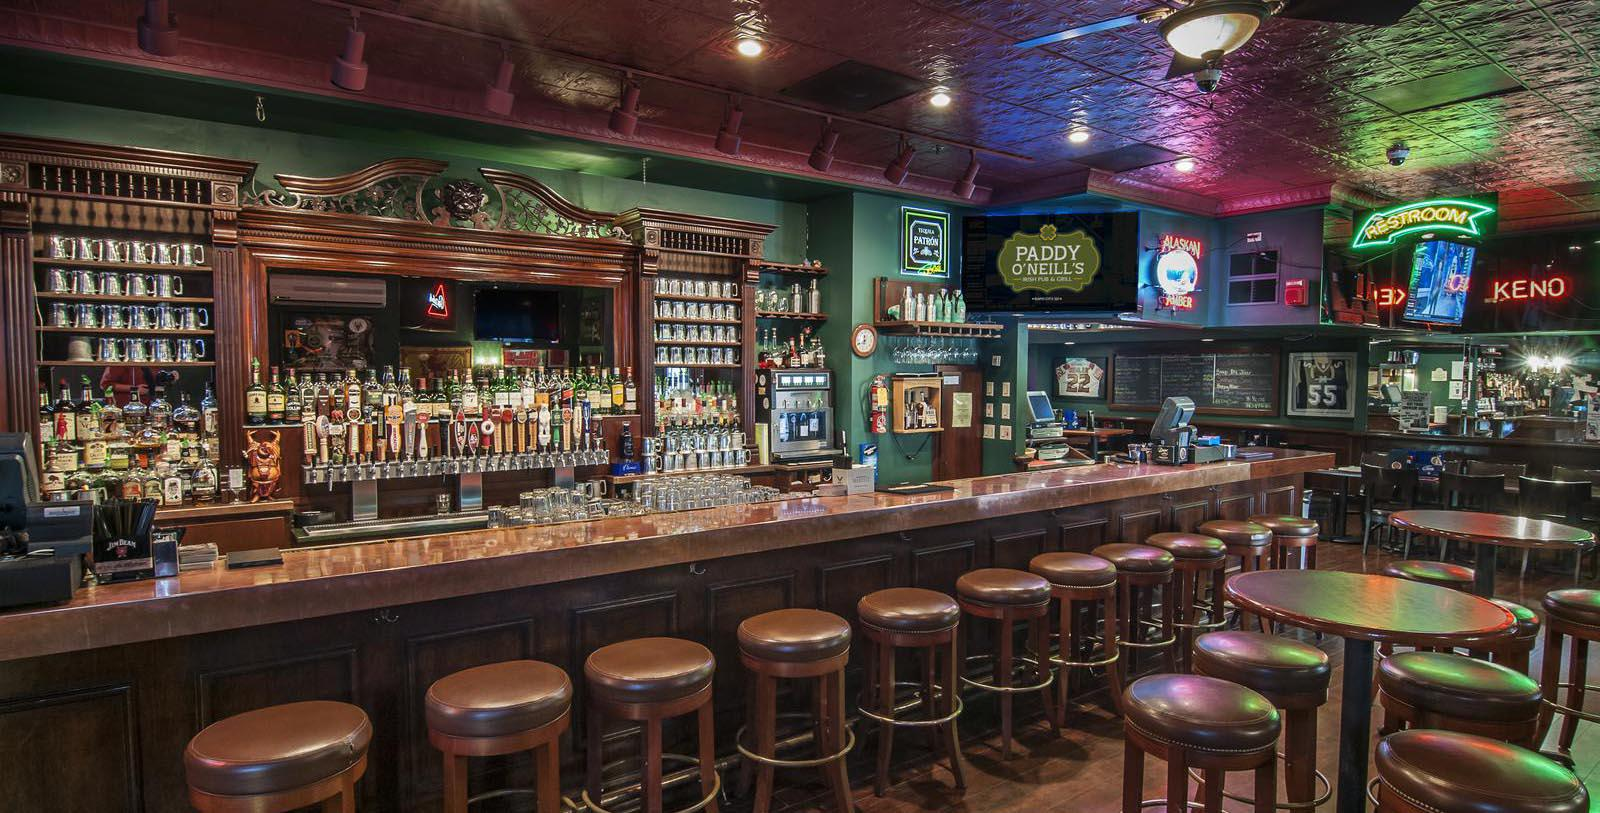 Image of Paddy O'Neill's Irish Pub, Hotel Alex Johnson in Rapid City, South Dakota, 1928, Member of Historic Hotels of America, Taste